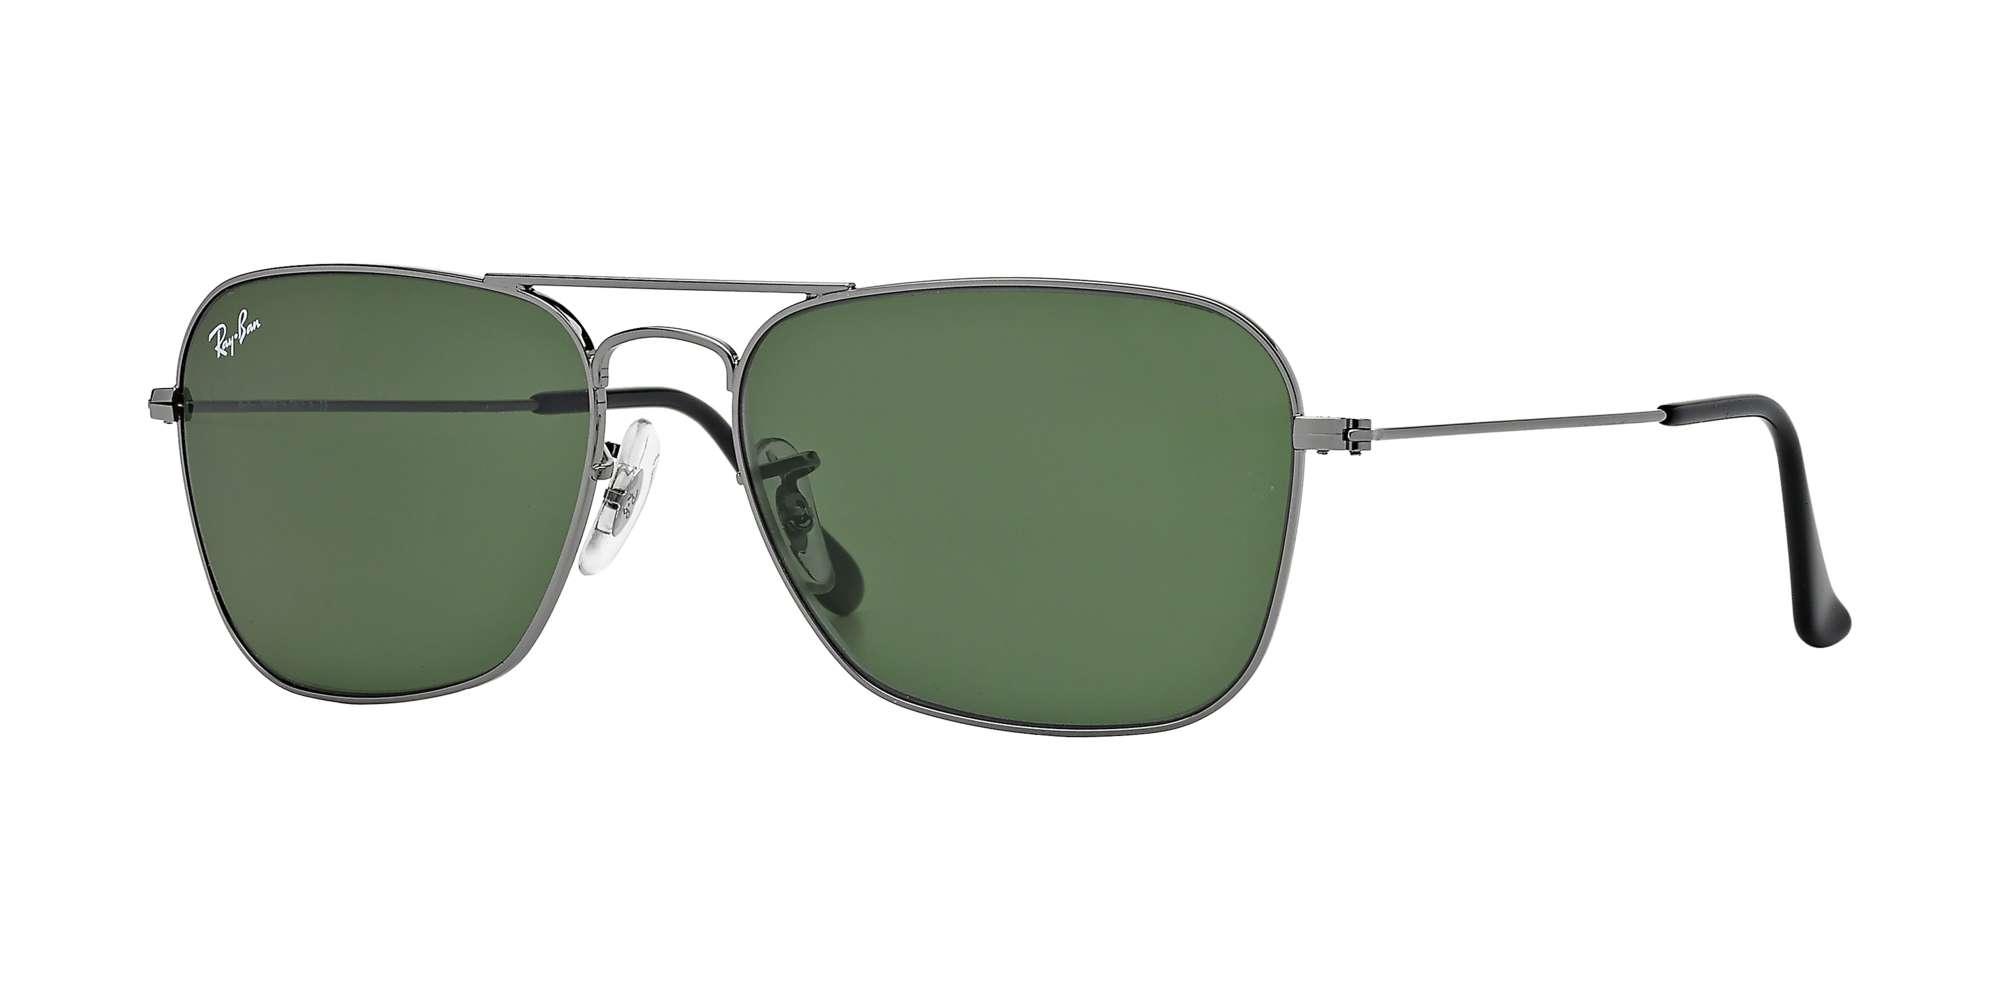 GUNMETAL / CRYSTAL GREEN lenses